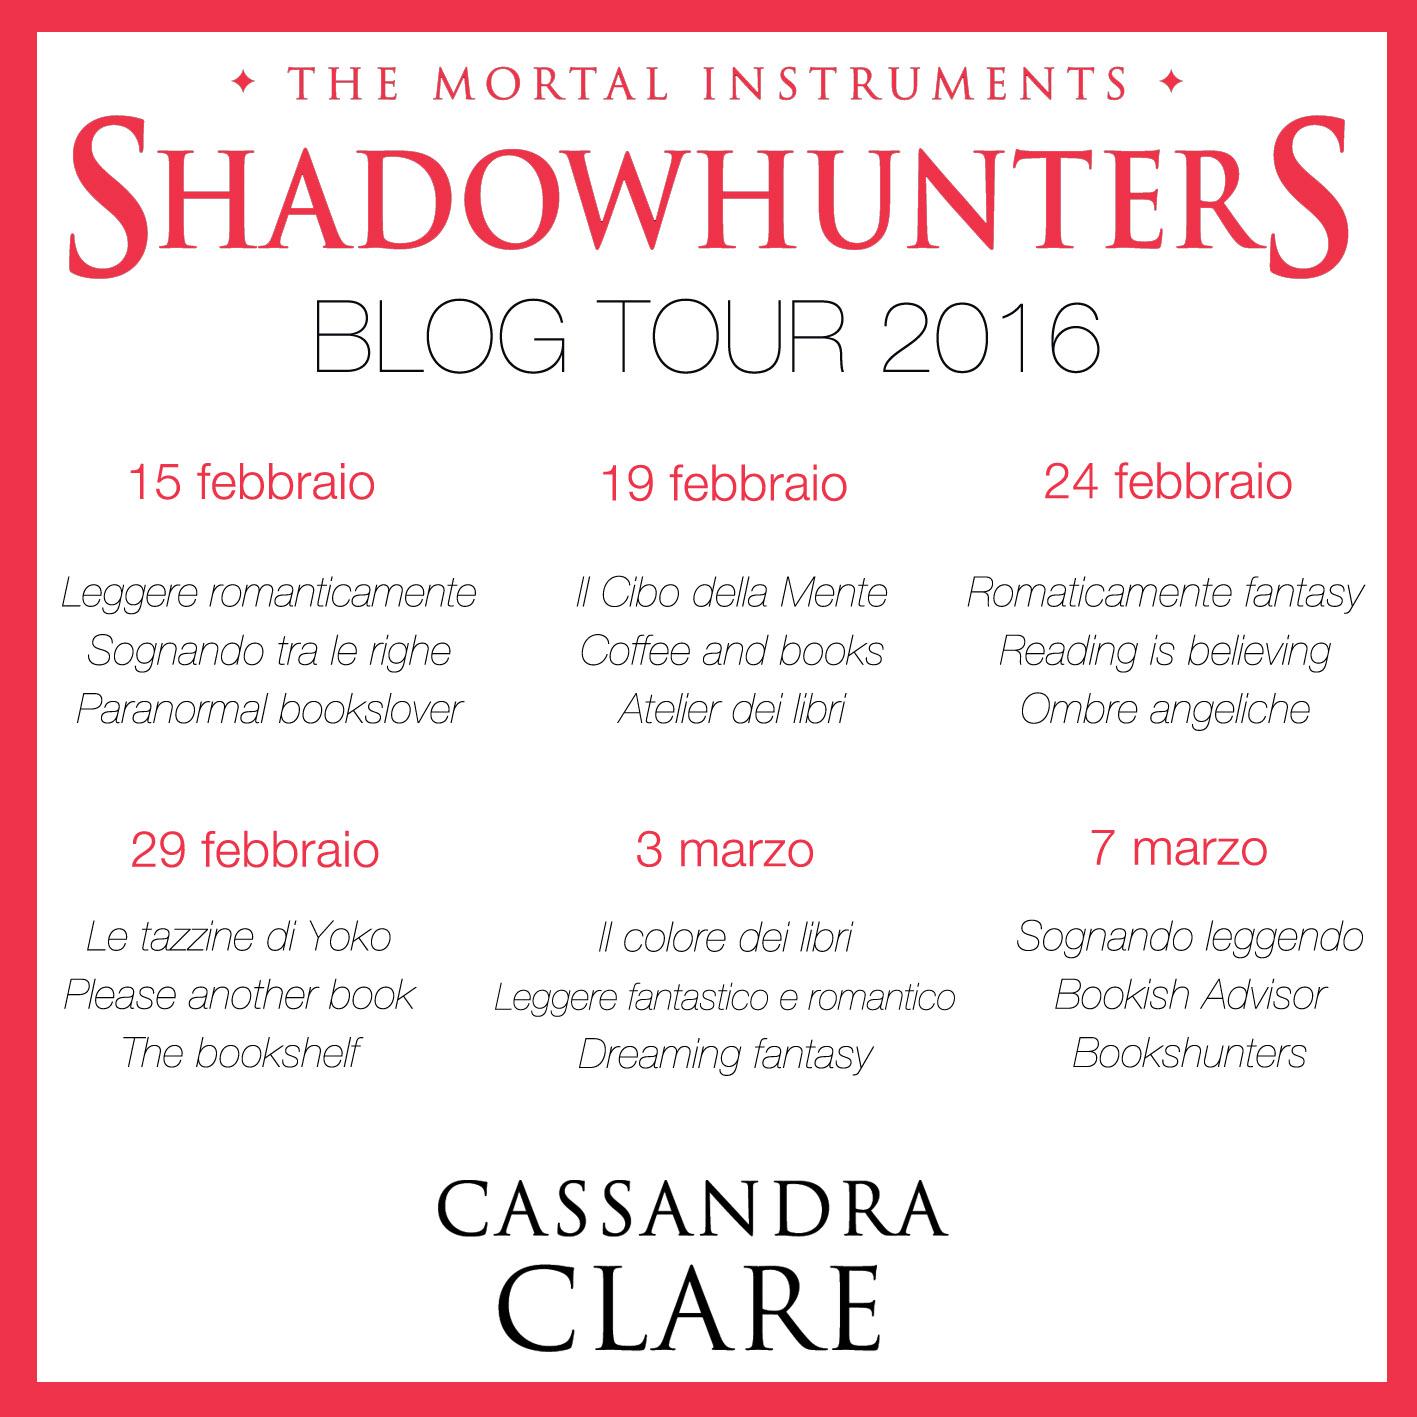 shadowhunters blogtour tappe le tazzine di yoko